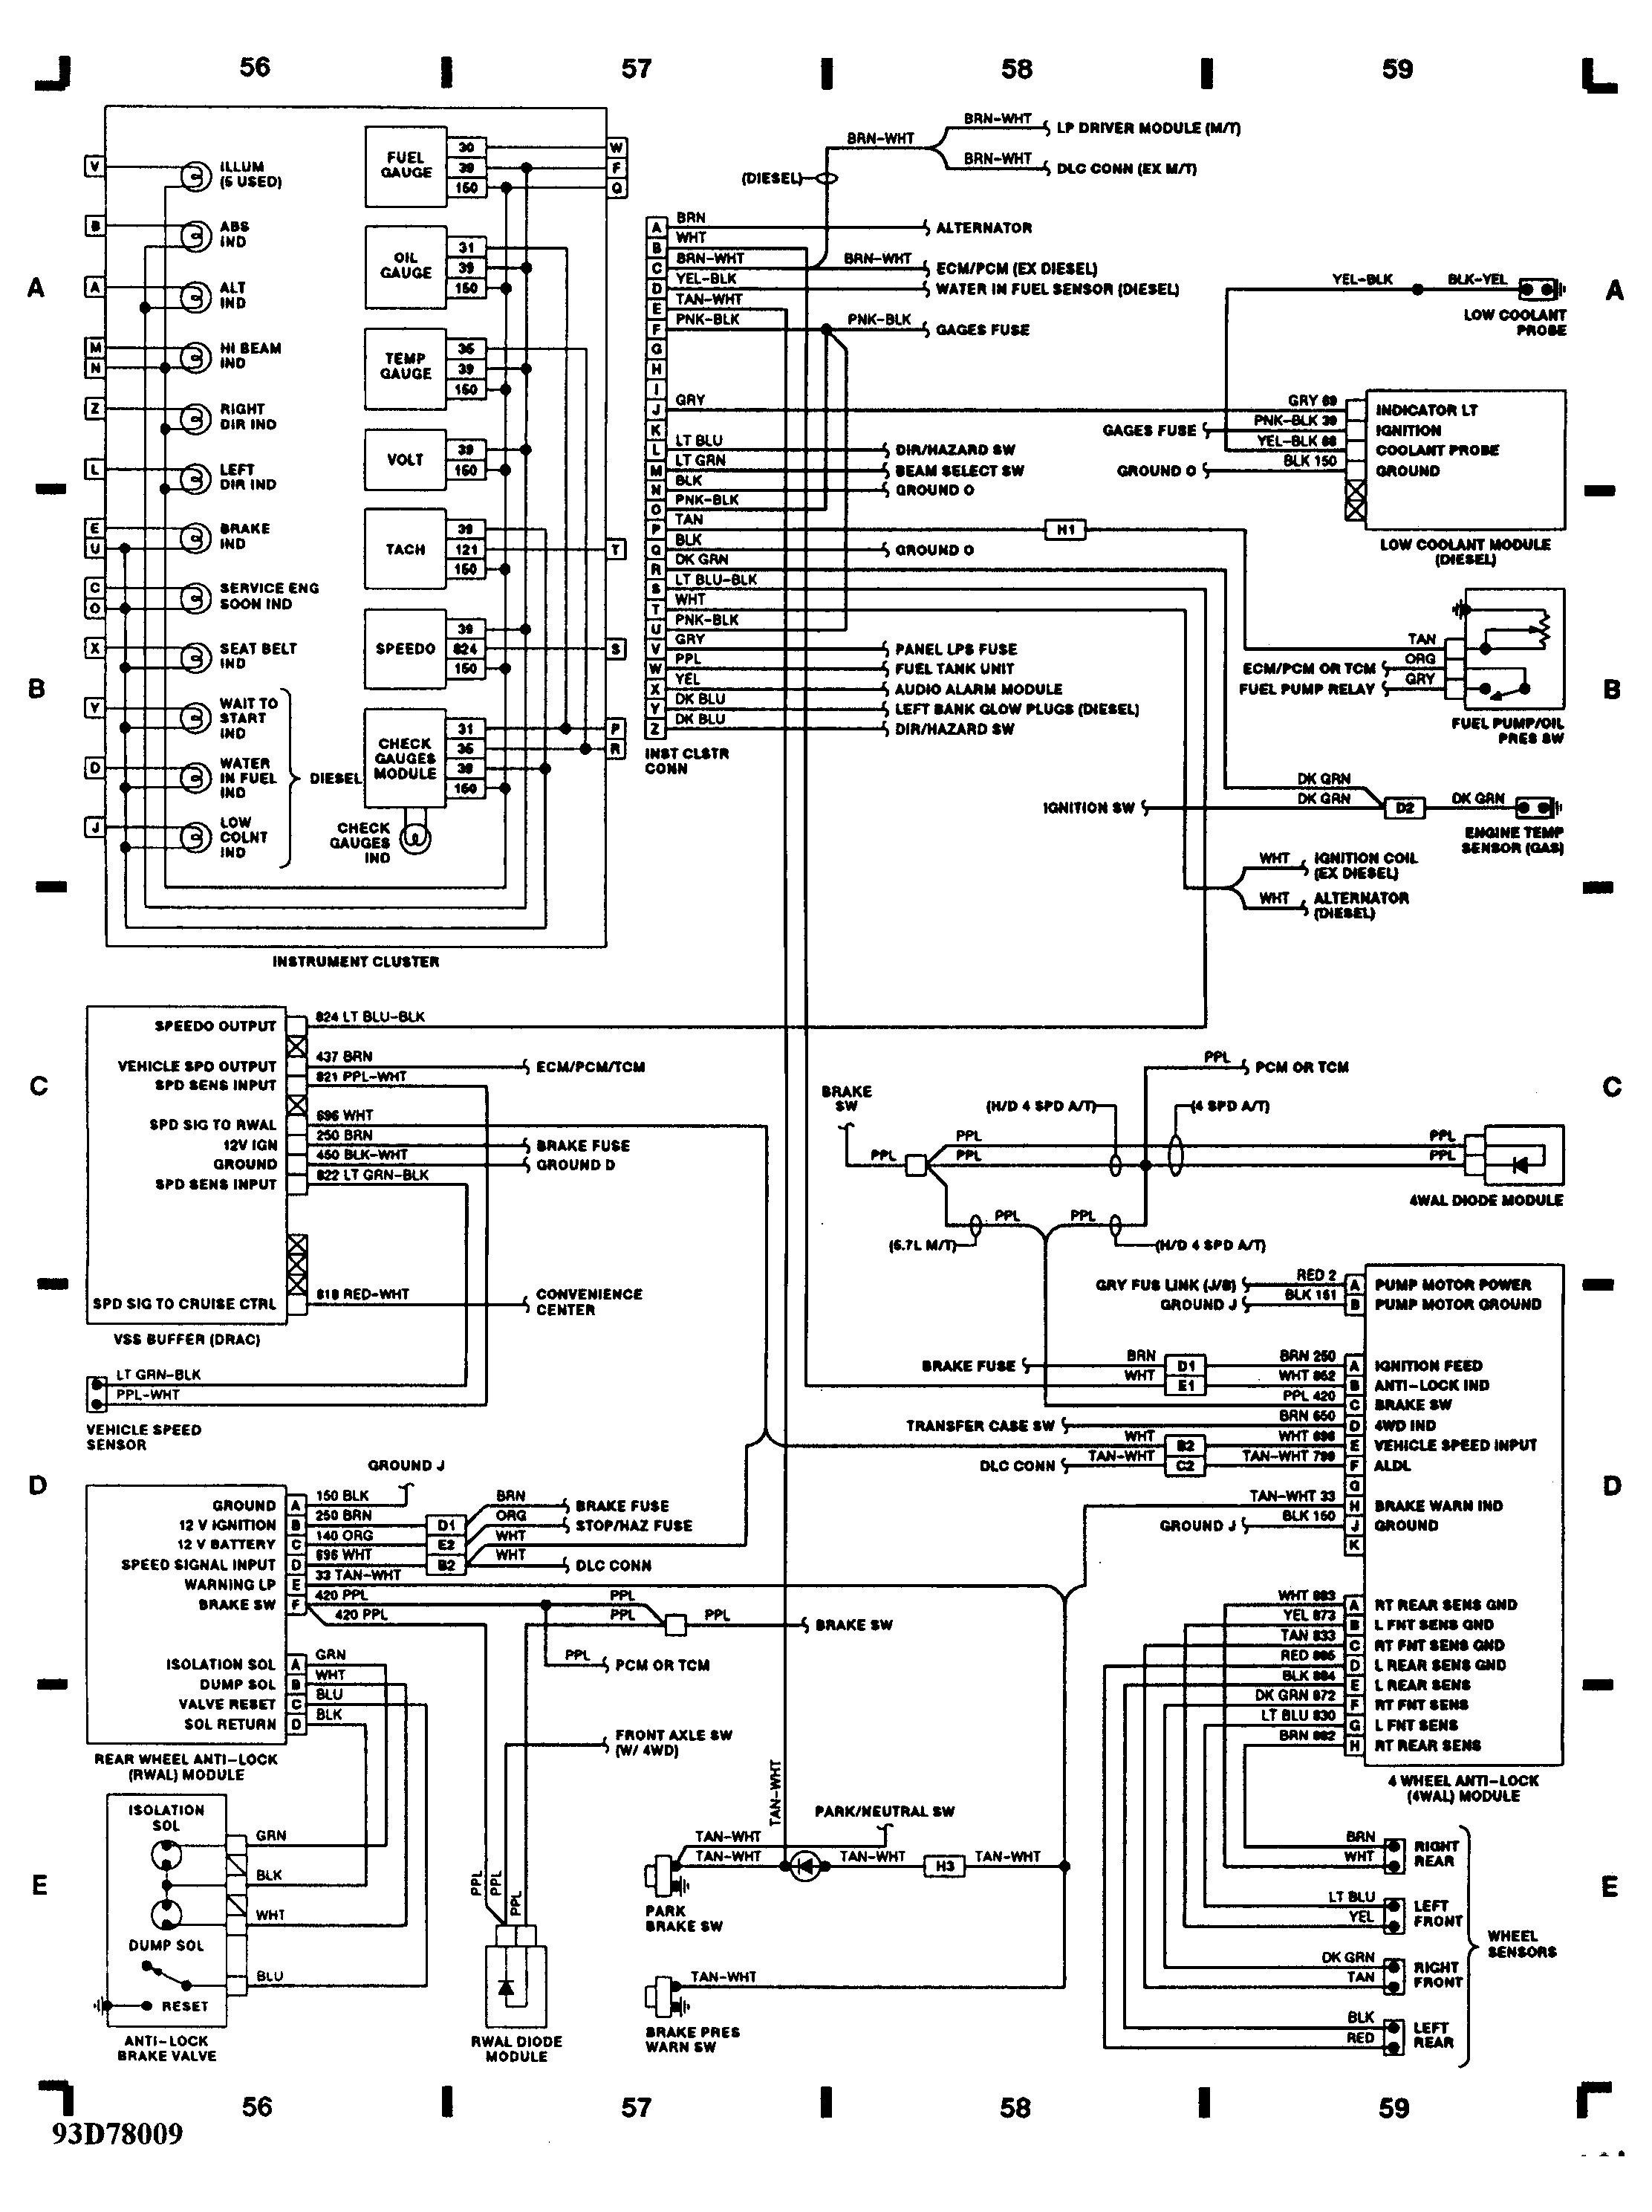 Diagram Of Car Engine Cooling System Gm Ls1 Engine Wiring Diagram Reveolution Wiring Diagram • Of Diagram Of Car Engine Cooling System